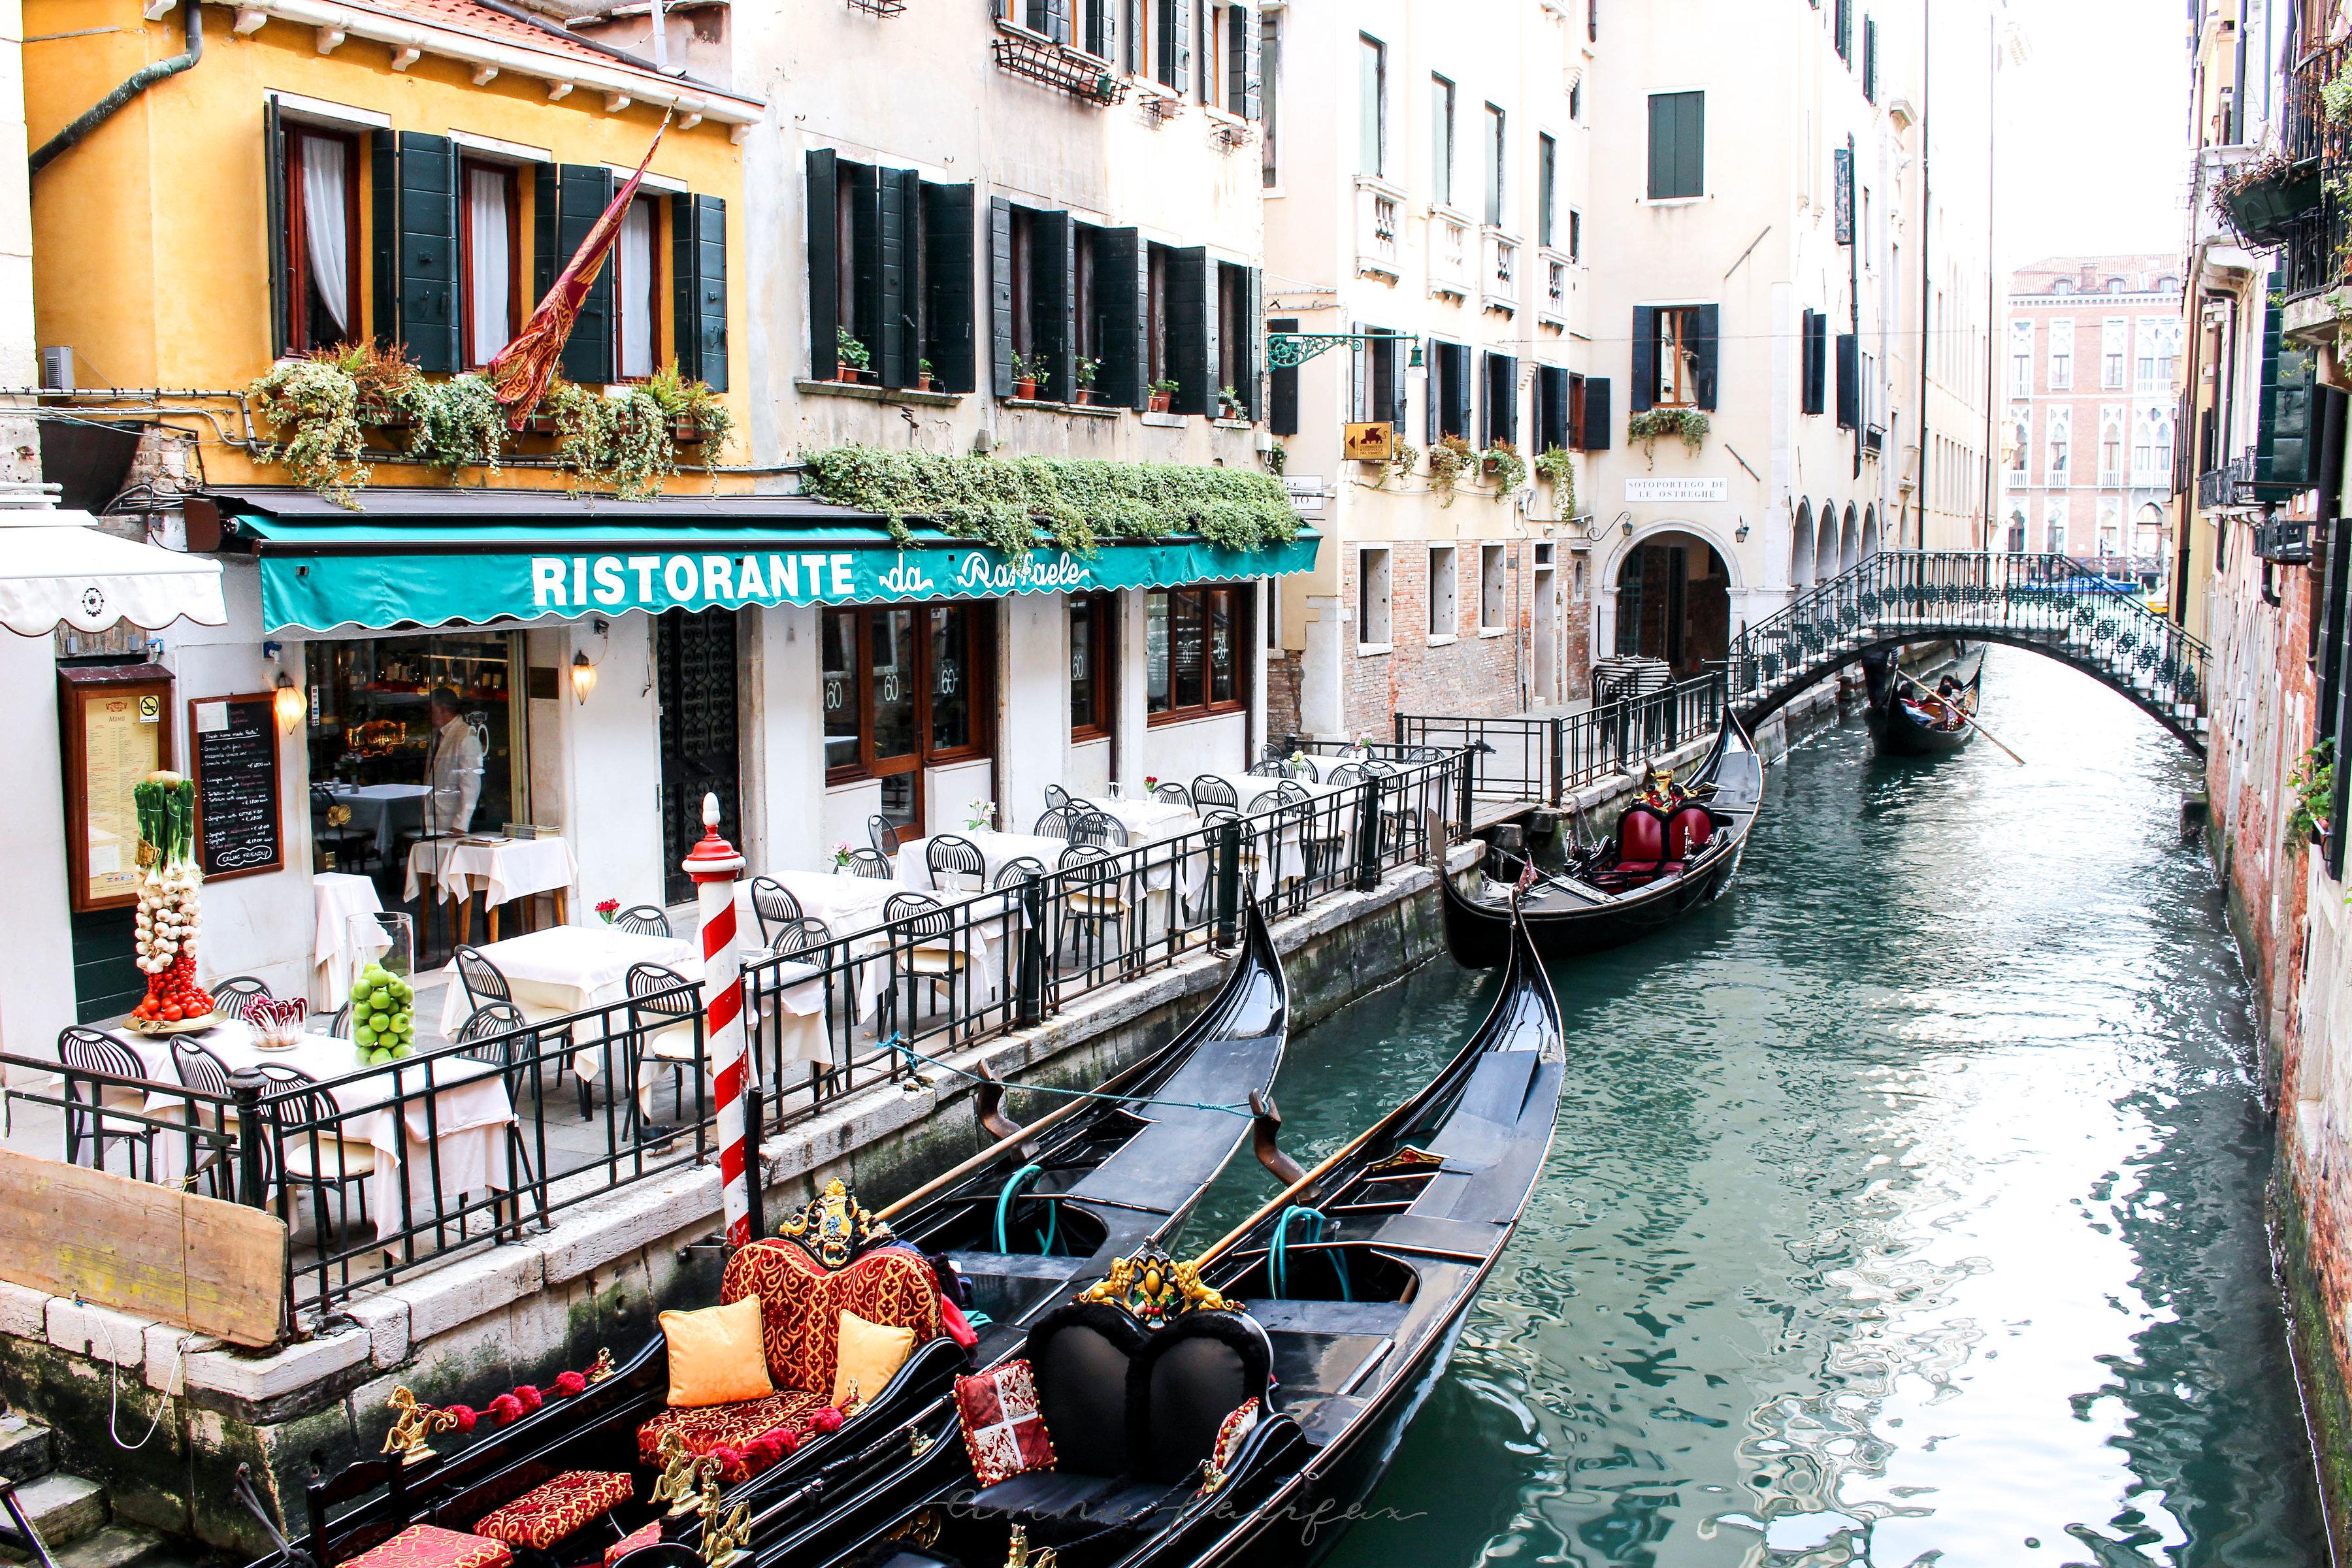 Gondolas along the Canal in Venice, Italy by Annie Fairfax